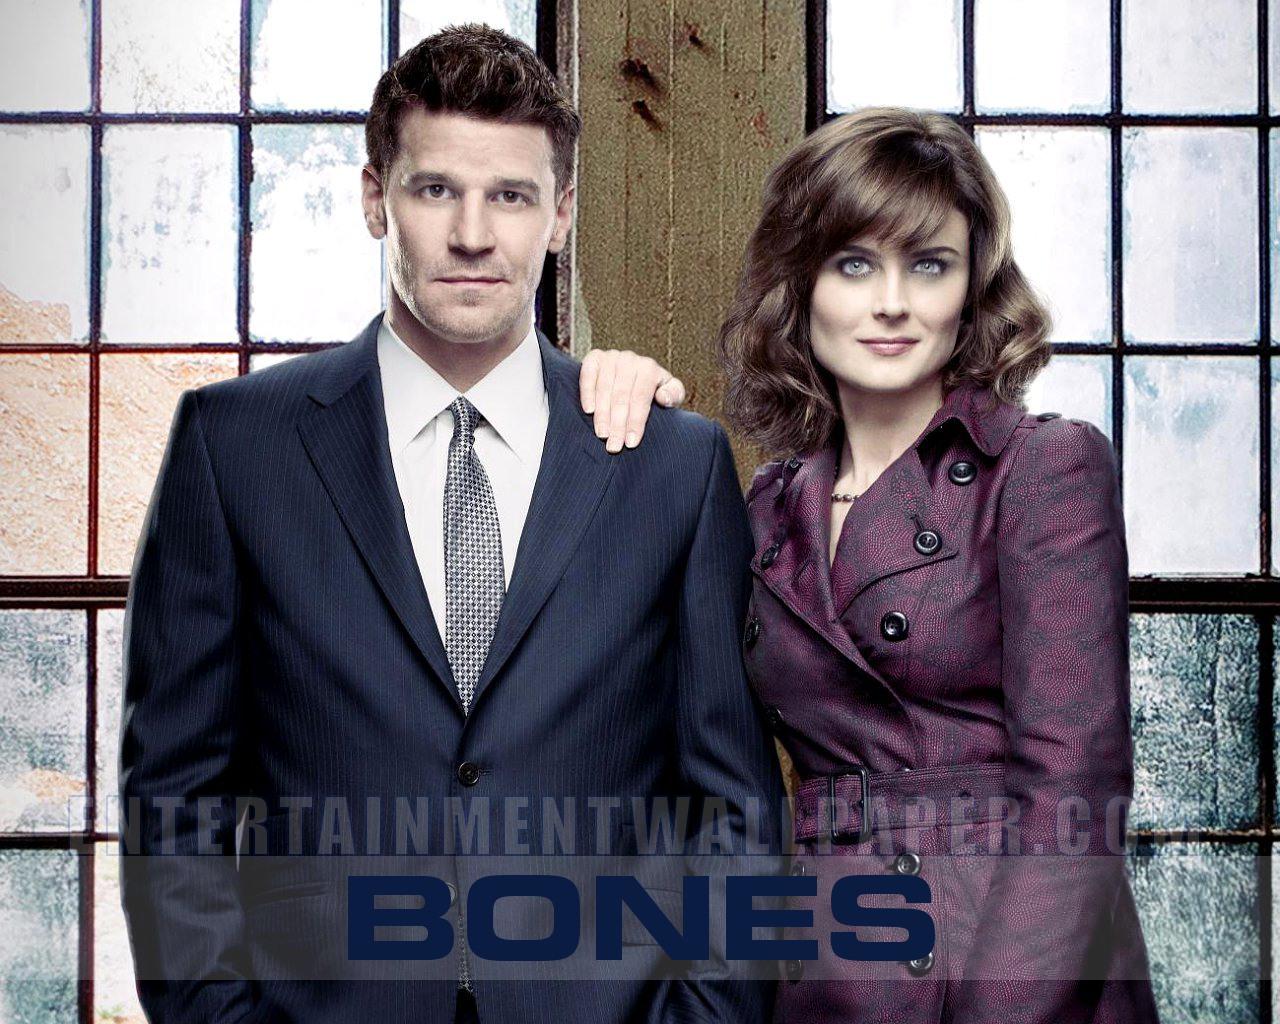 Tv fashion recap: new girl and bones